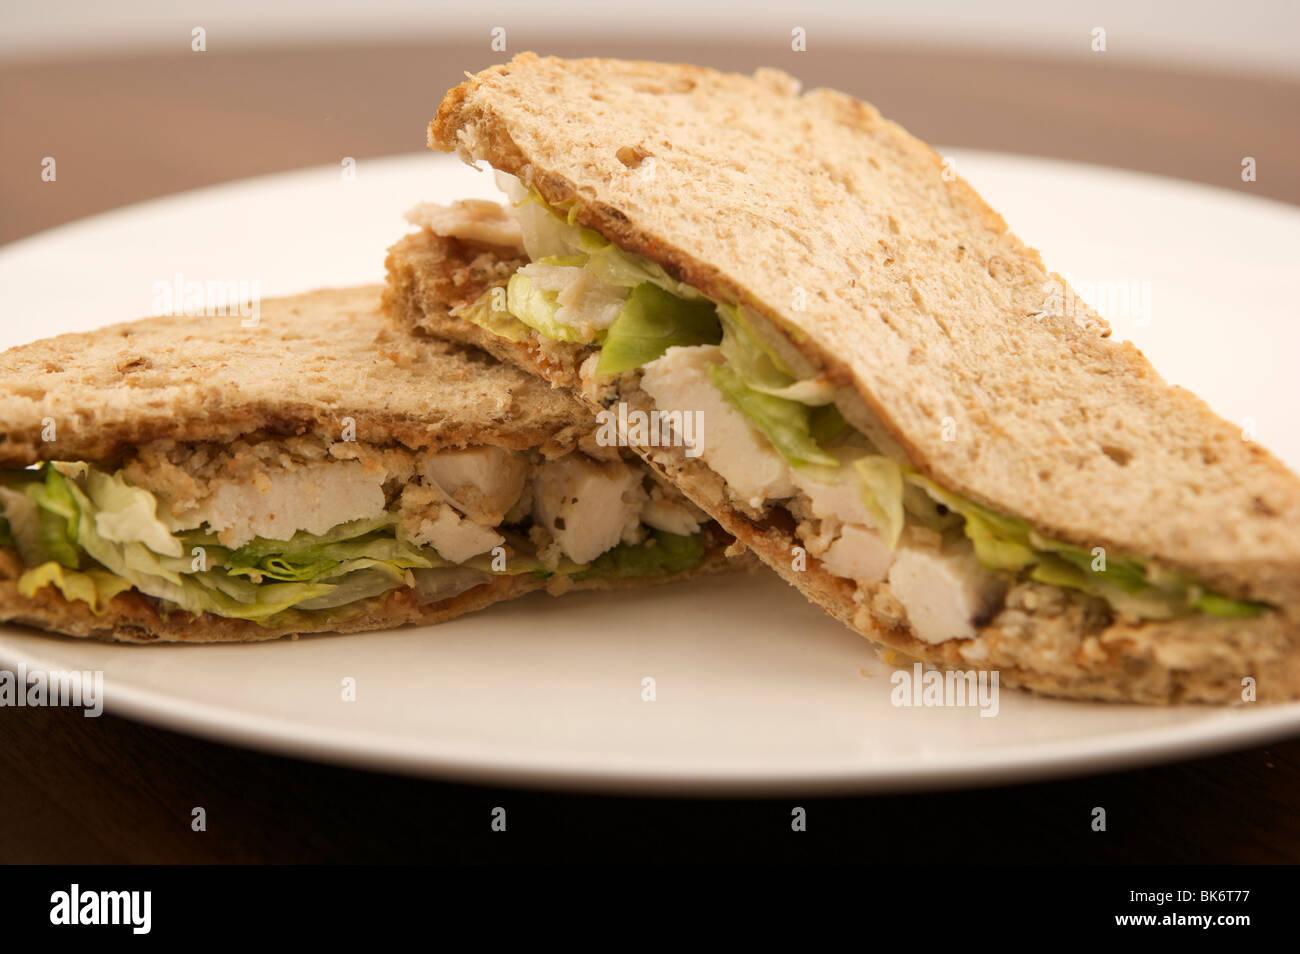 Salad roast chicken sandwich - Stock Image